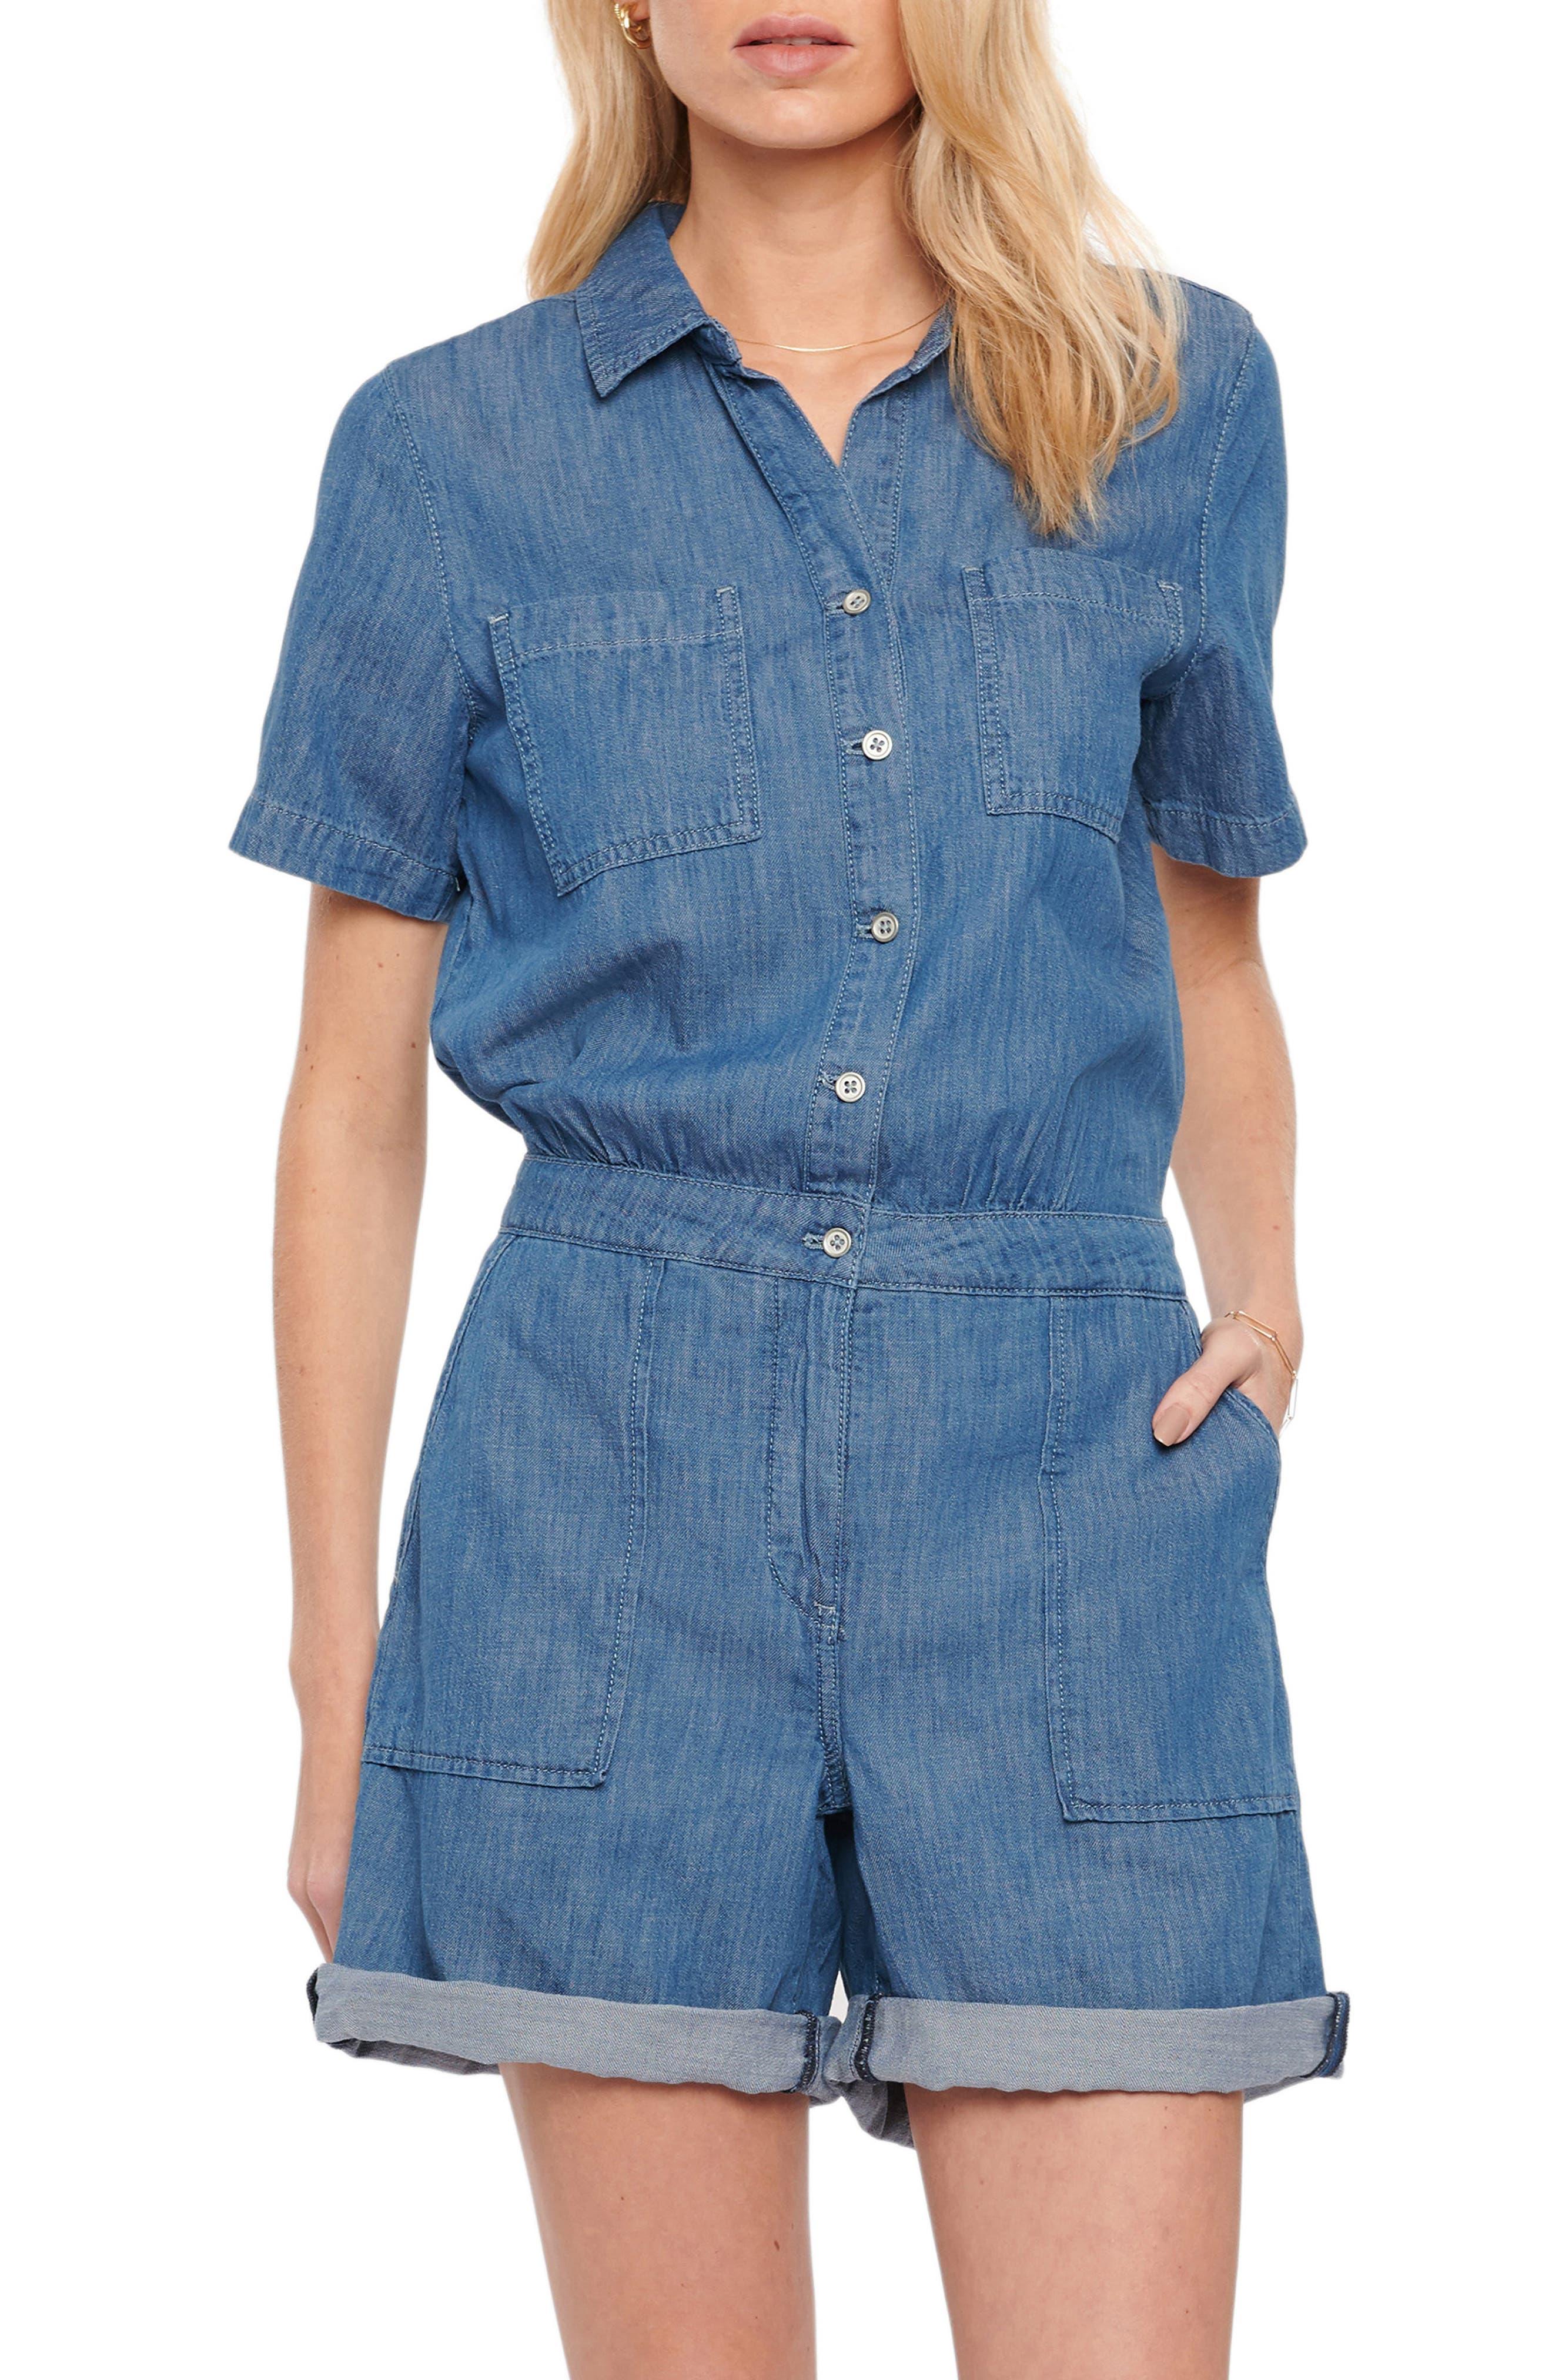 70s Shorts | Denim, High Rise, Athletic Womens Nydj Relaxed Denim Romper Size Large - Blue $129.00 AT vintagedancer.com